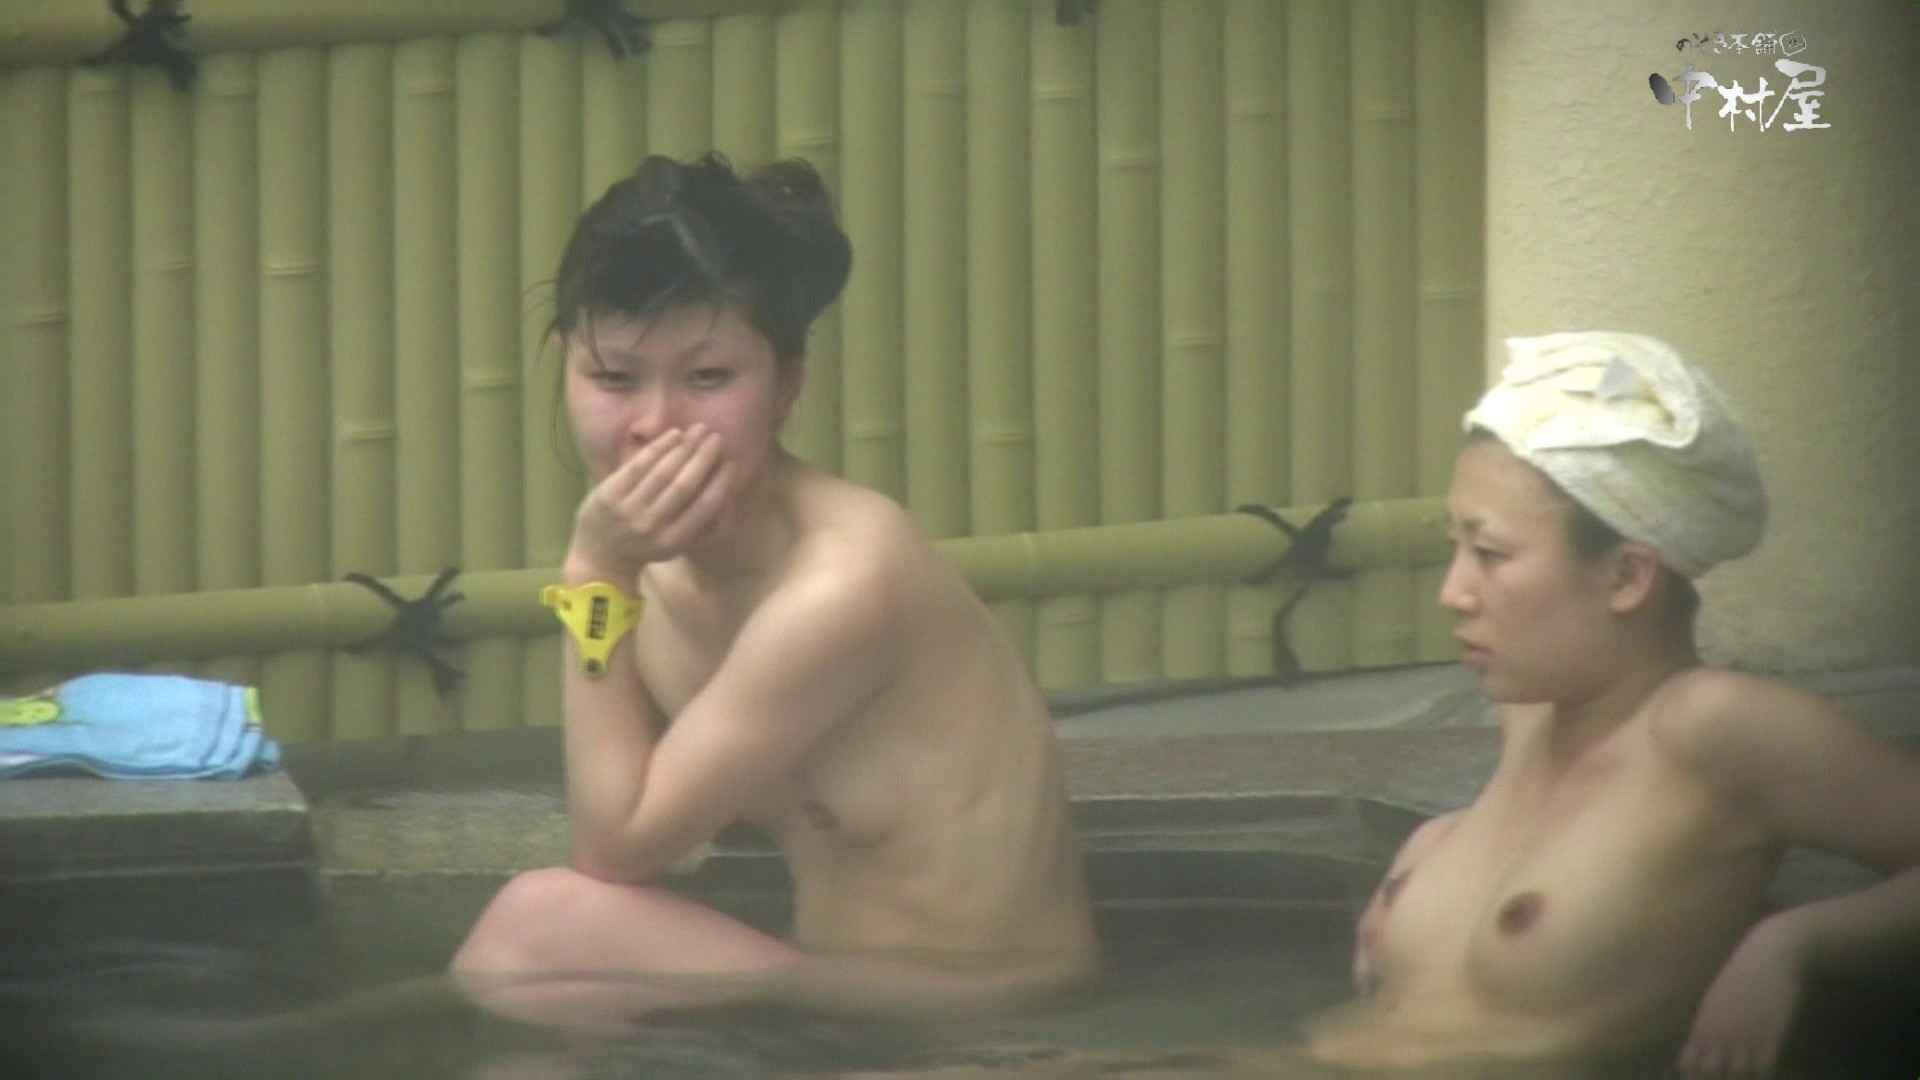 Aquaな露天風呂Vol.890 0   0  85連発 15